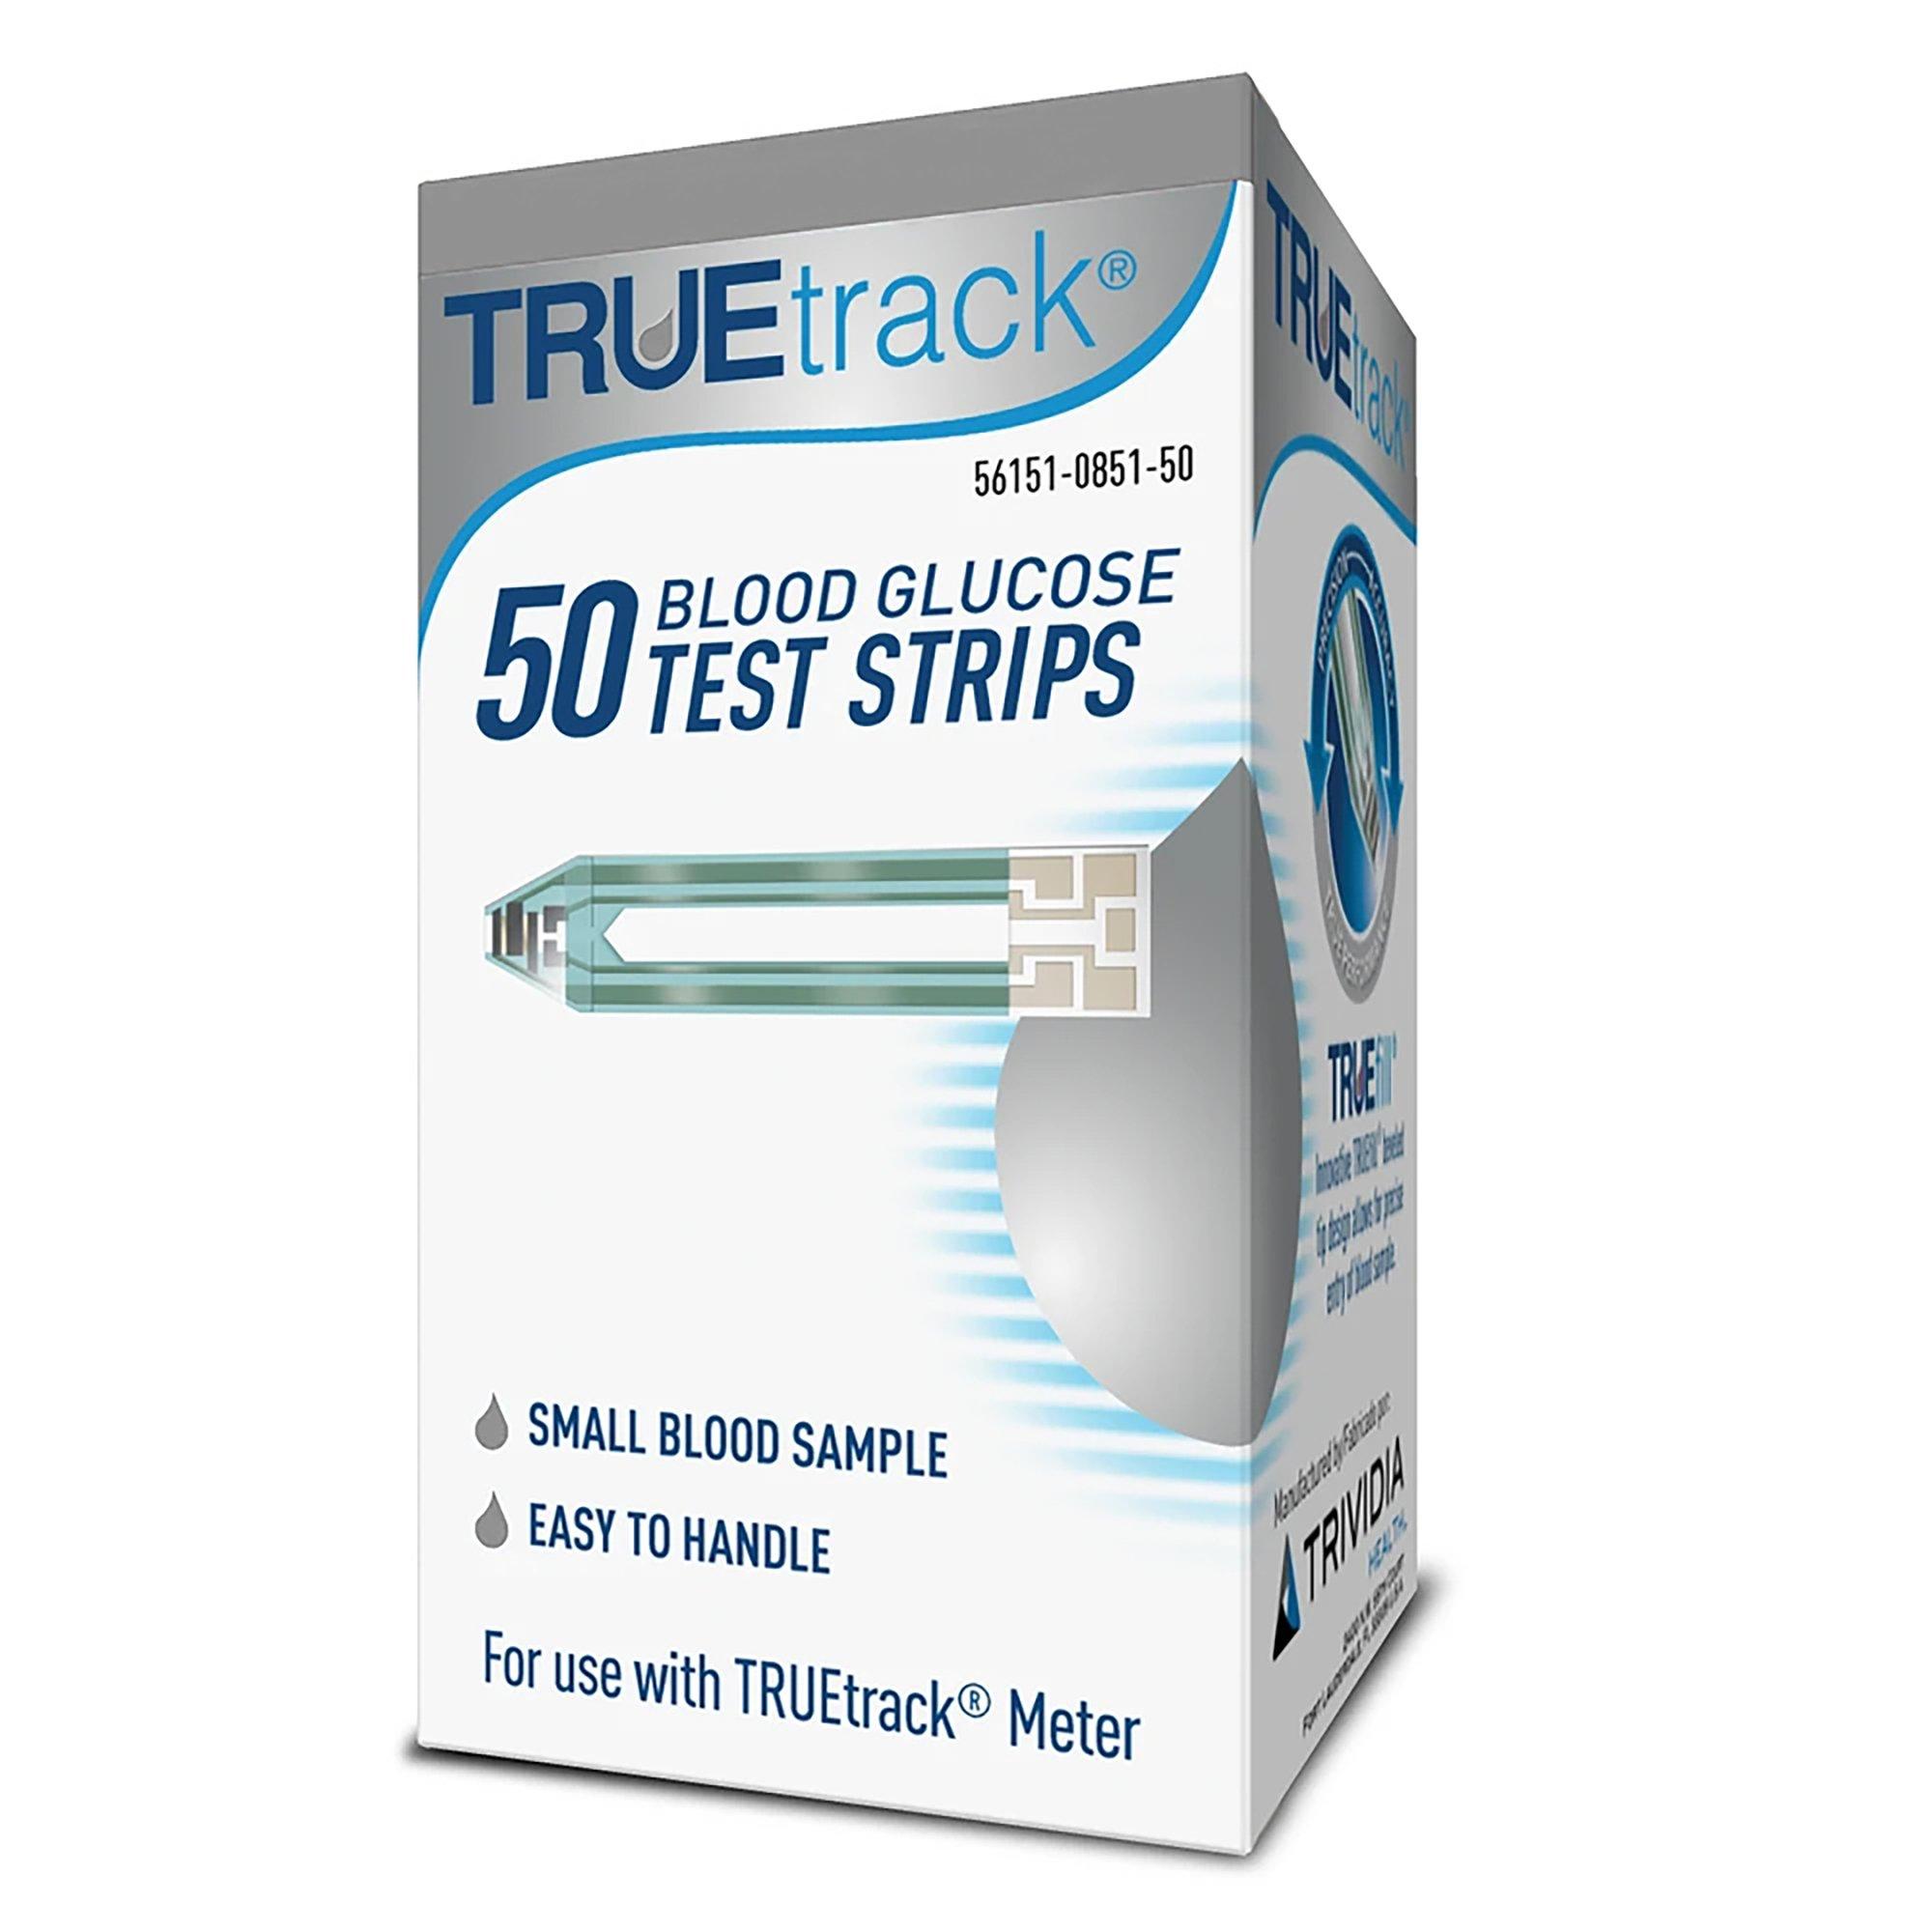 TRUETrack Blood Glucose Test Strips, A3H01-87, TRUEtrack Blood Glucose Test Strips